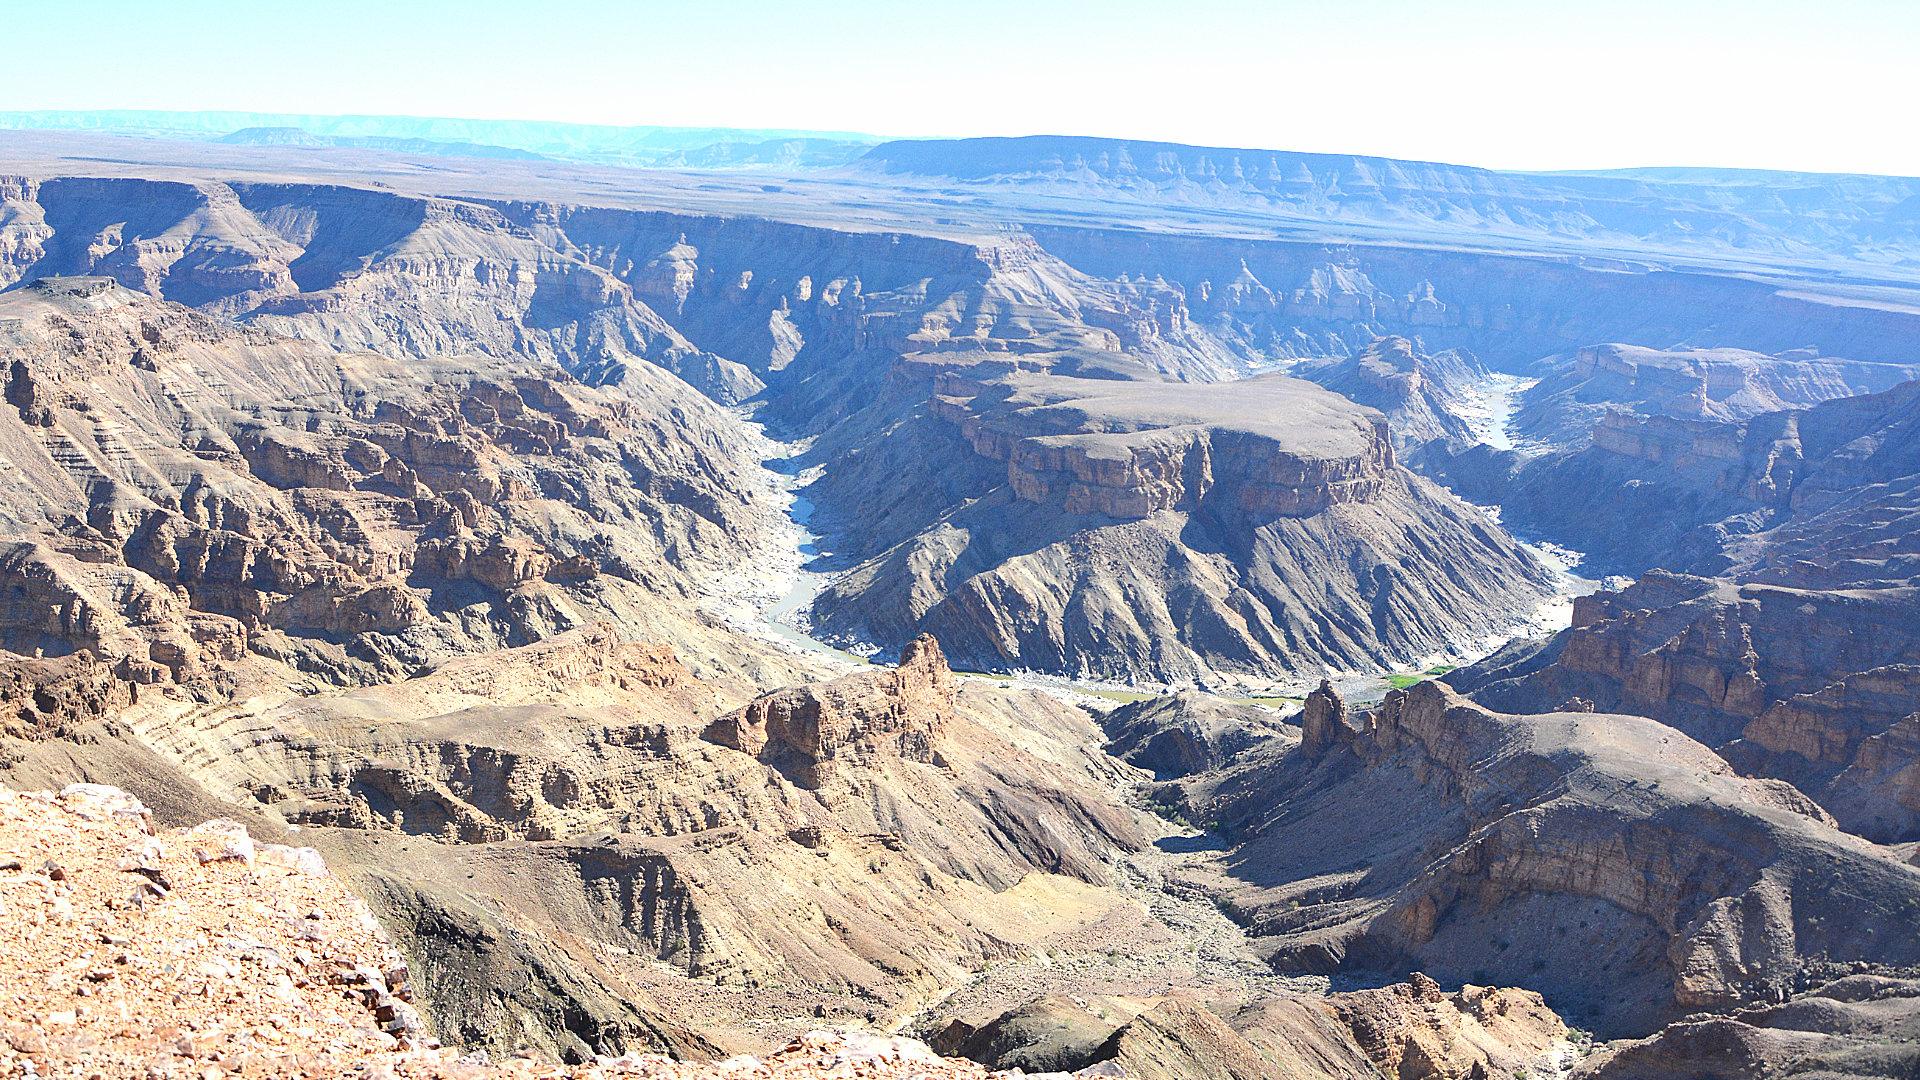 Fishriver Canyon in Namibia (Foto: Sabina Schneider)